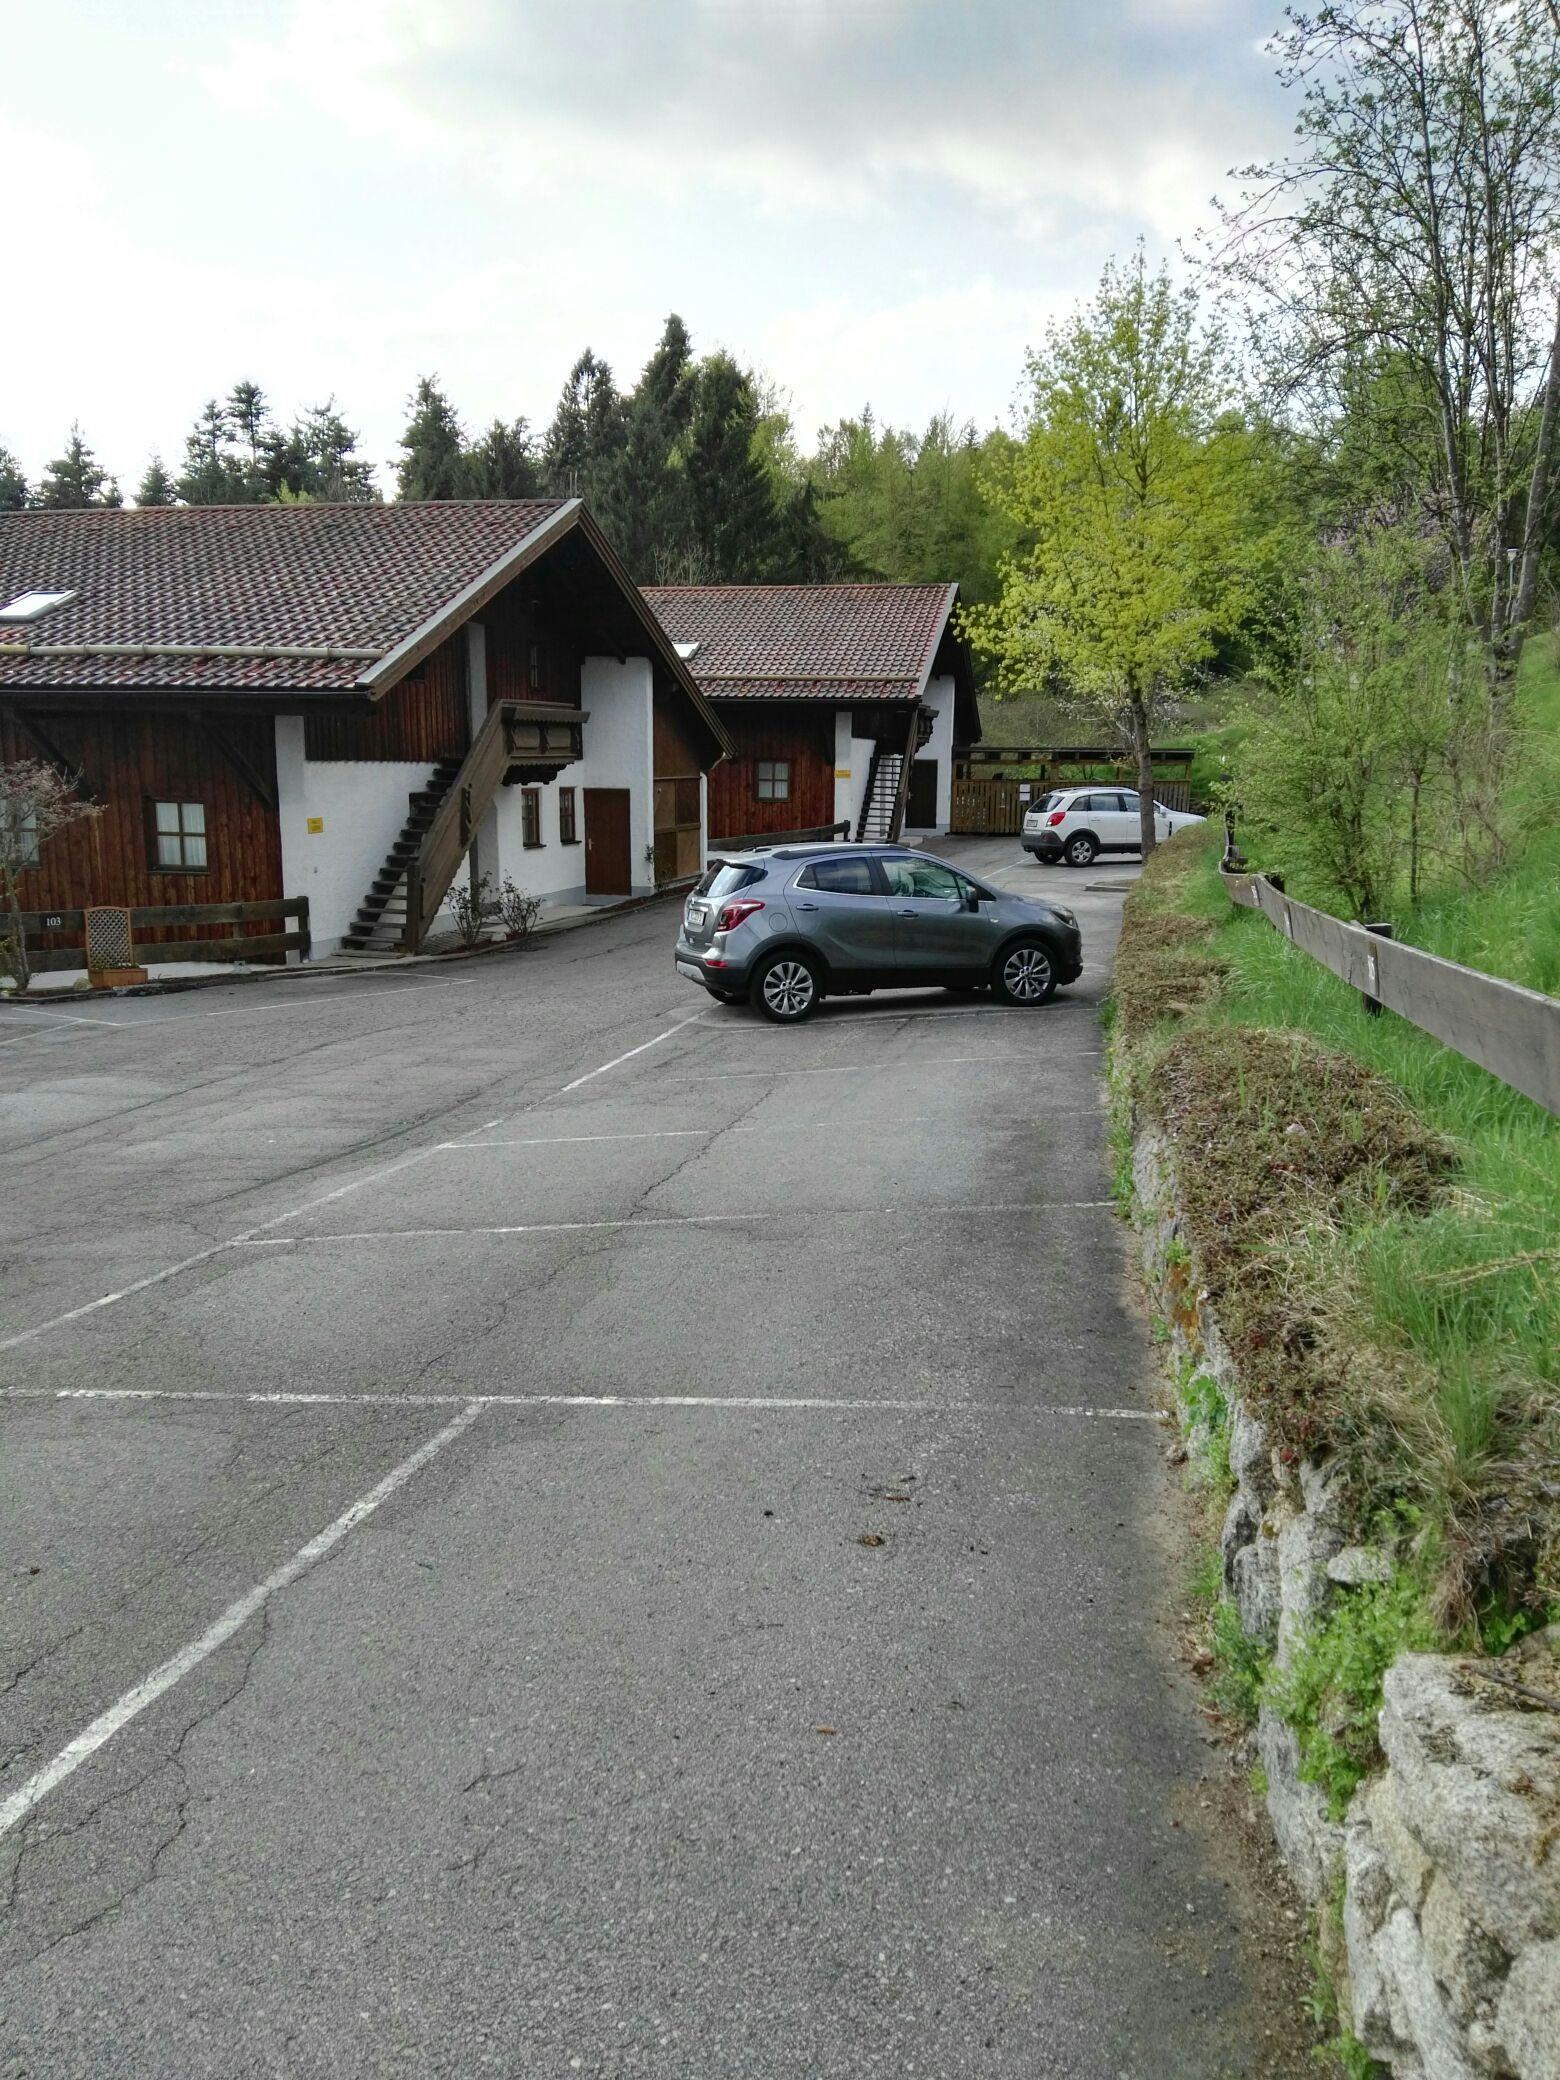 Single hauzenberg